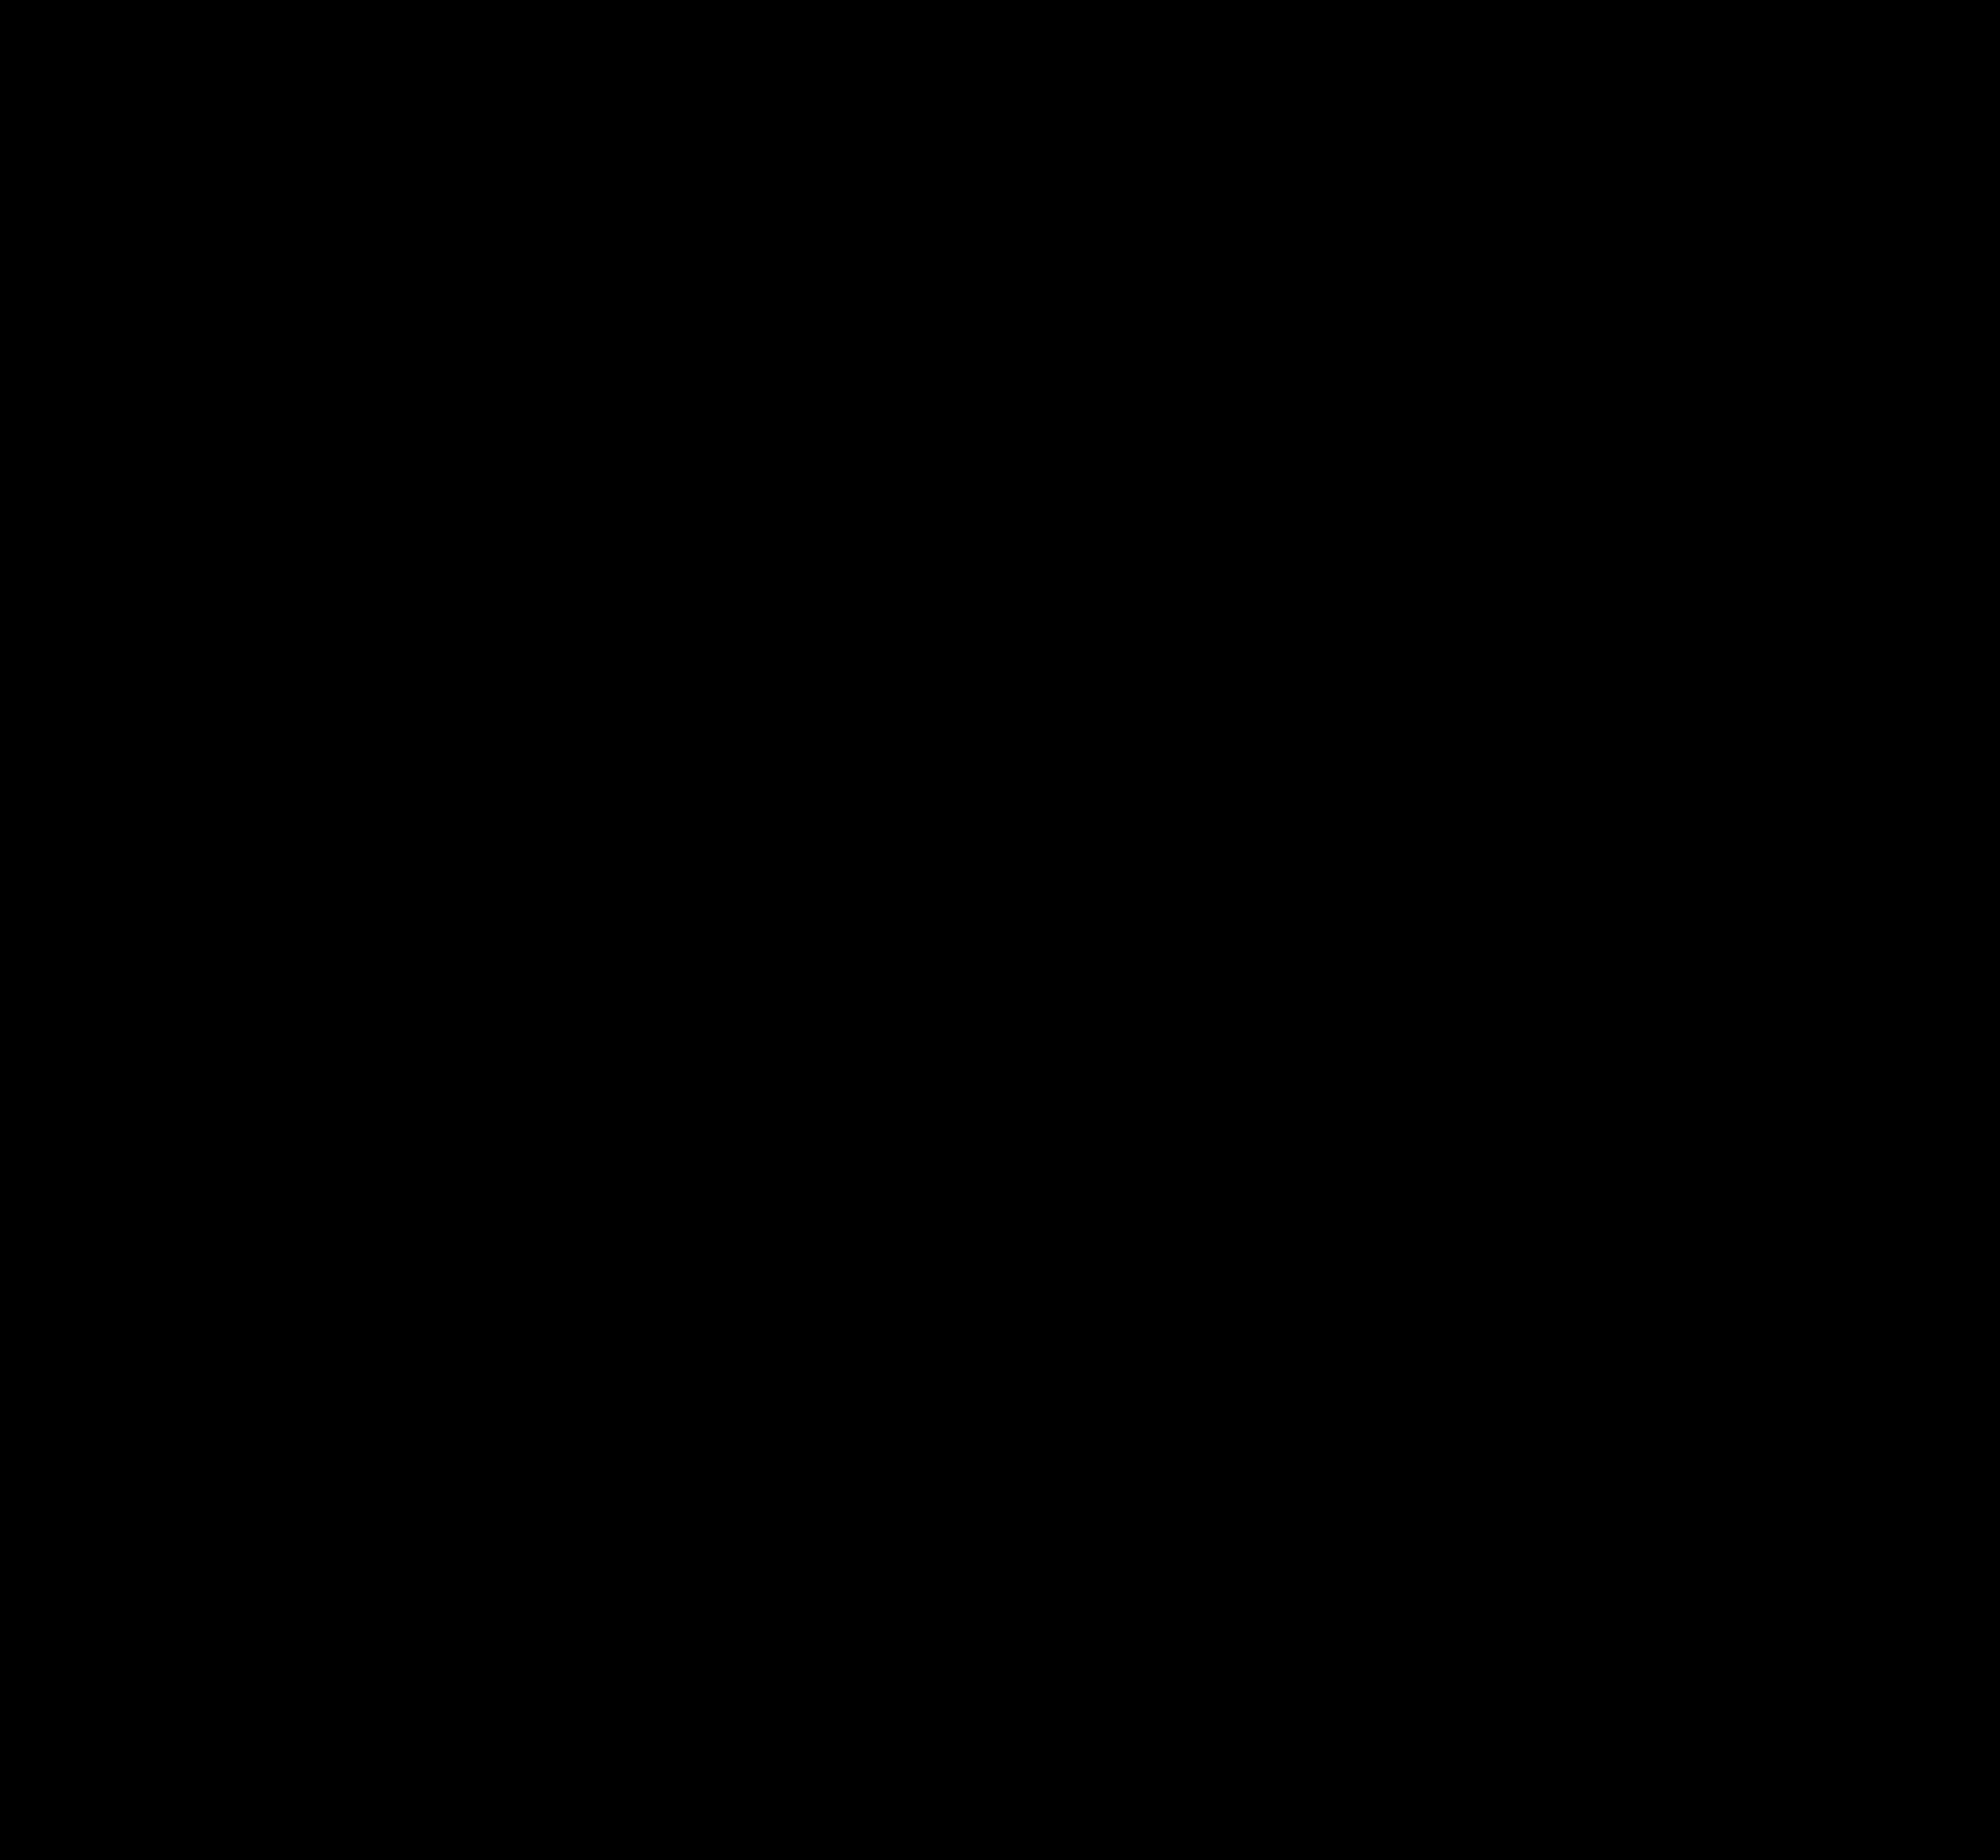 timberland logo 5 - Timberland Logo